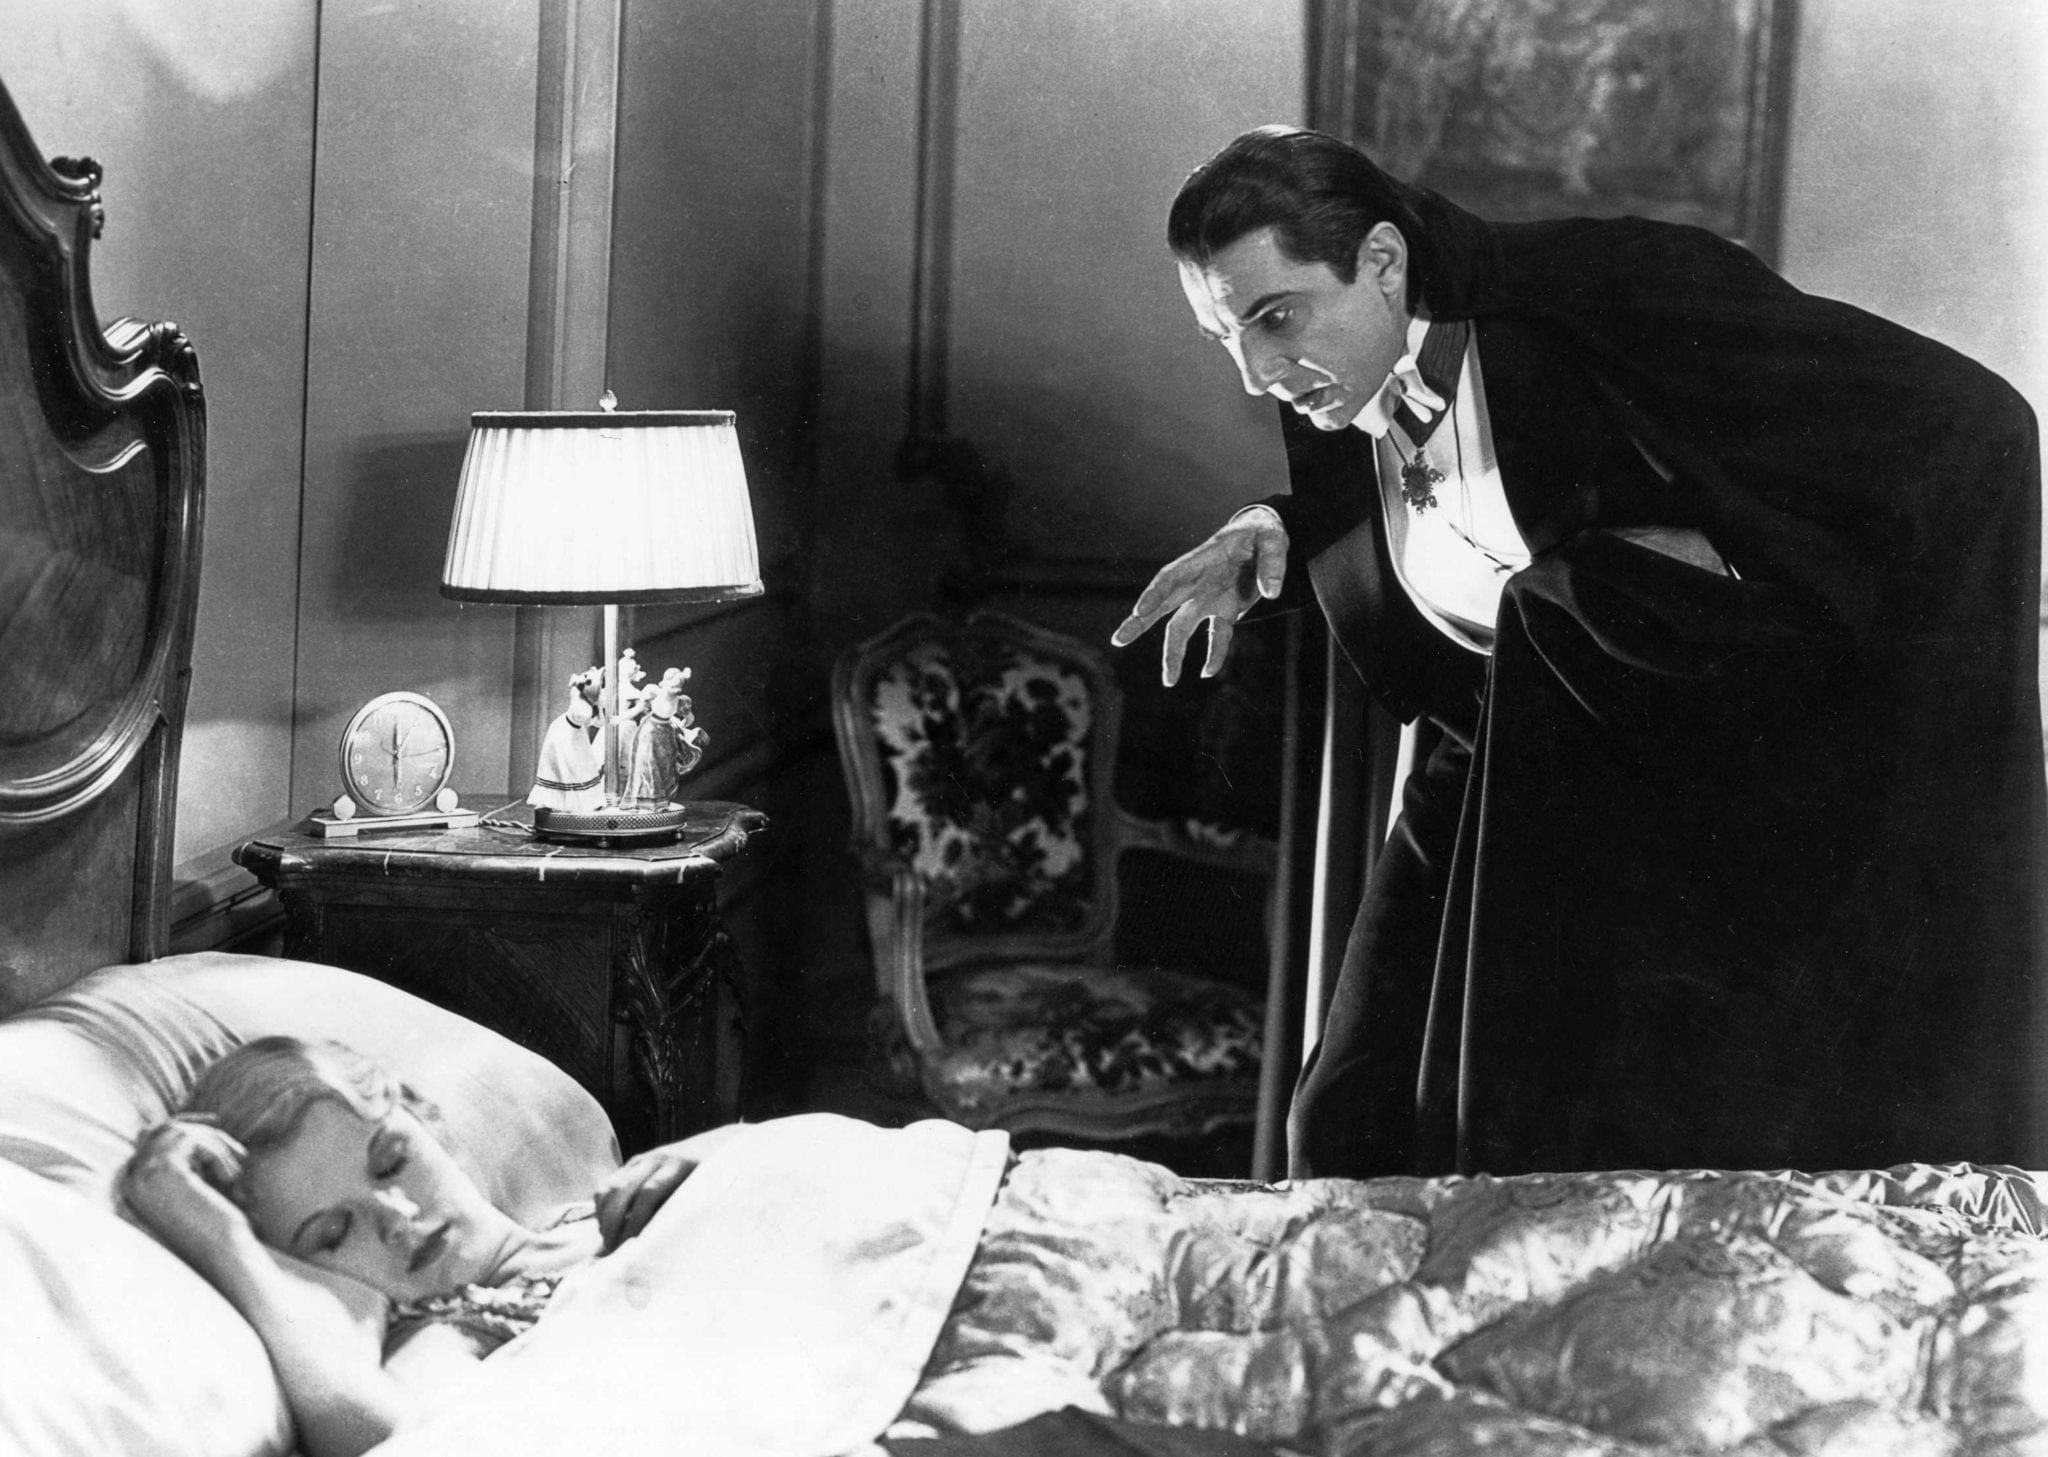 Bela Lugosi in the 1931 version of Dracula.